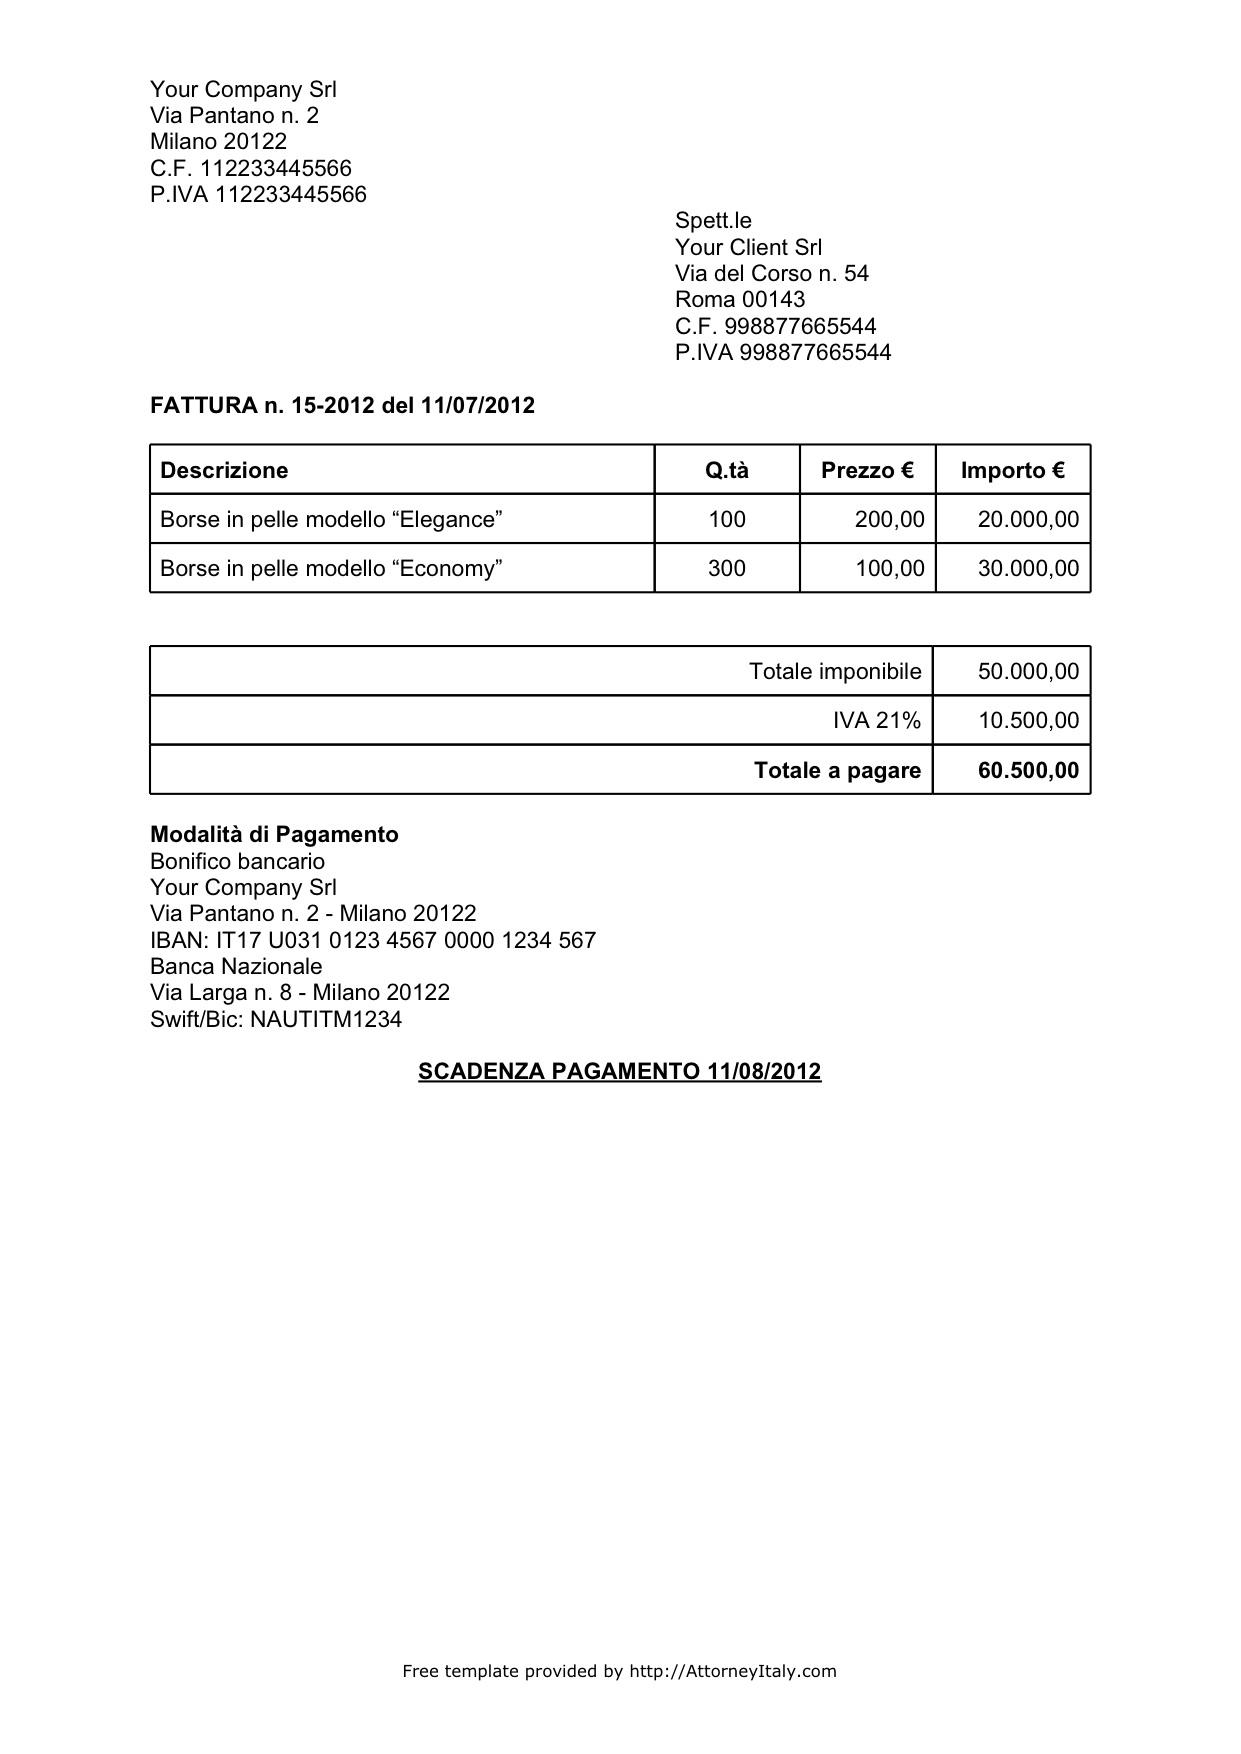 italian invoice template a invoice or an invoice